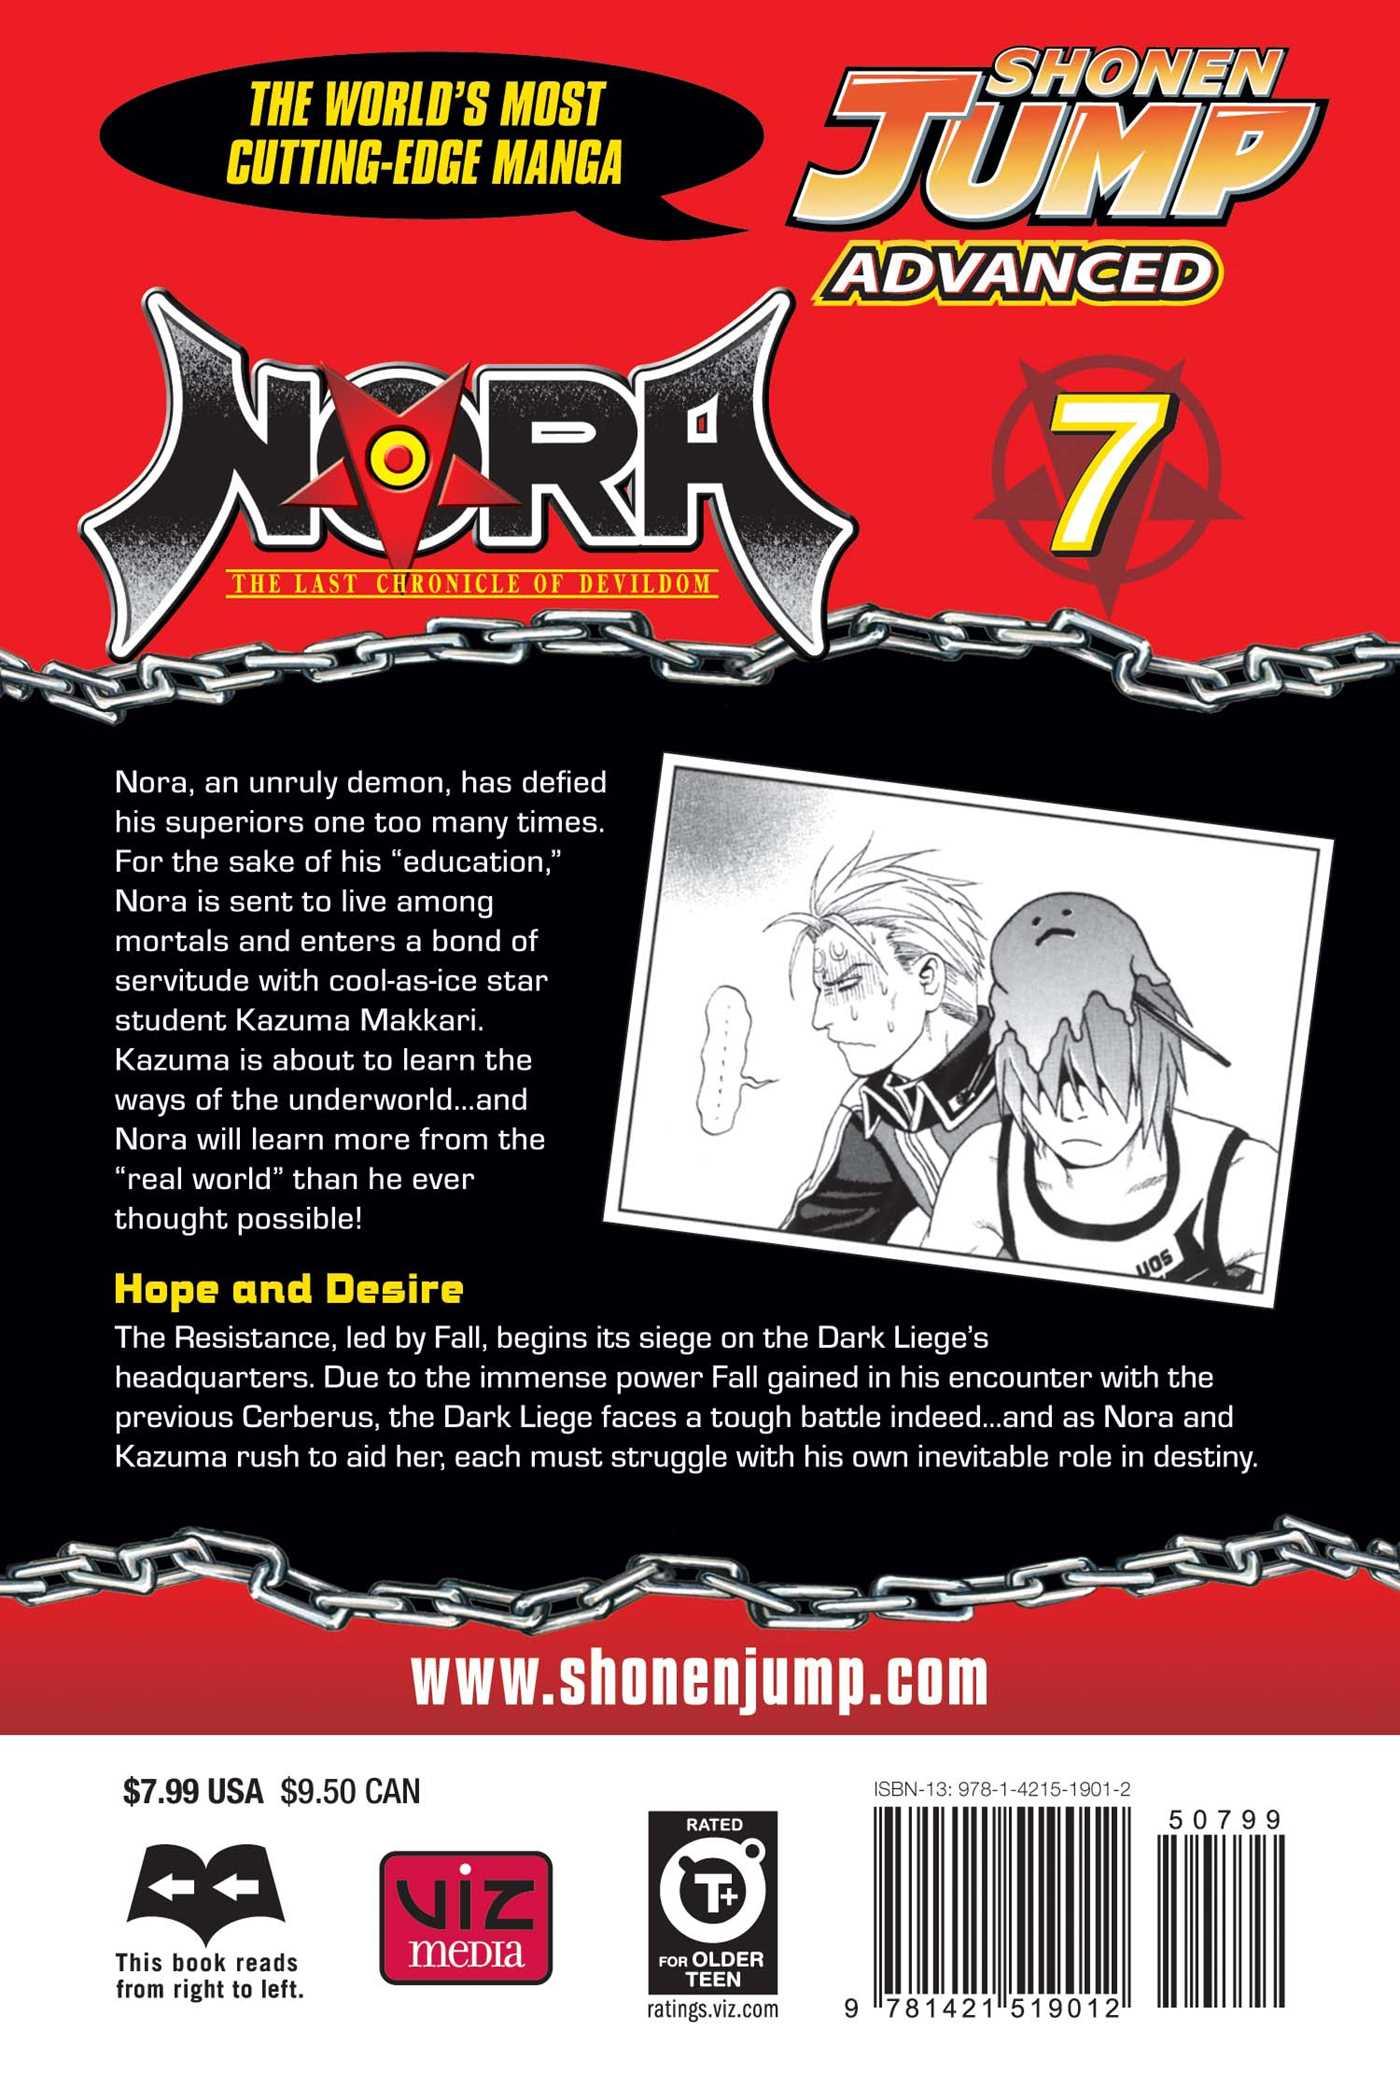 Nora the last chronicle of devildom vol 7 9781421519012 hr back